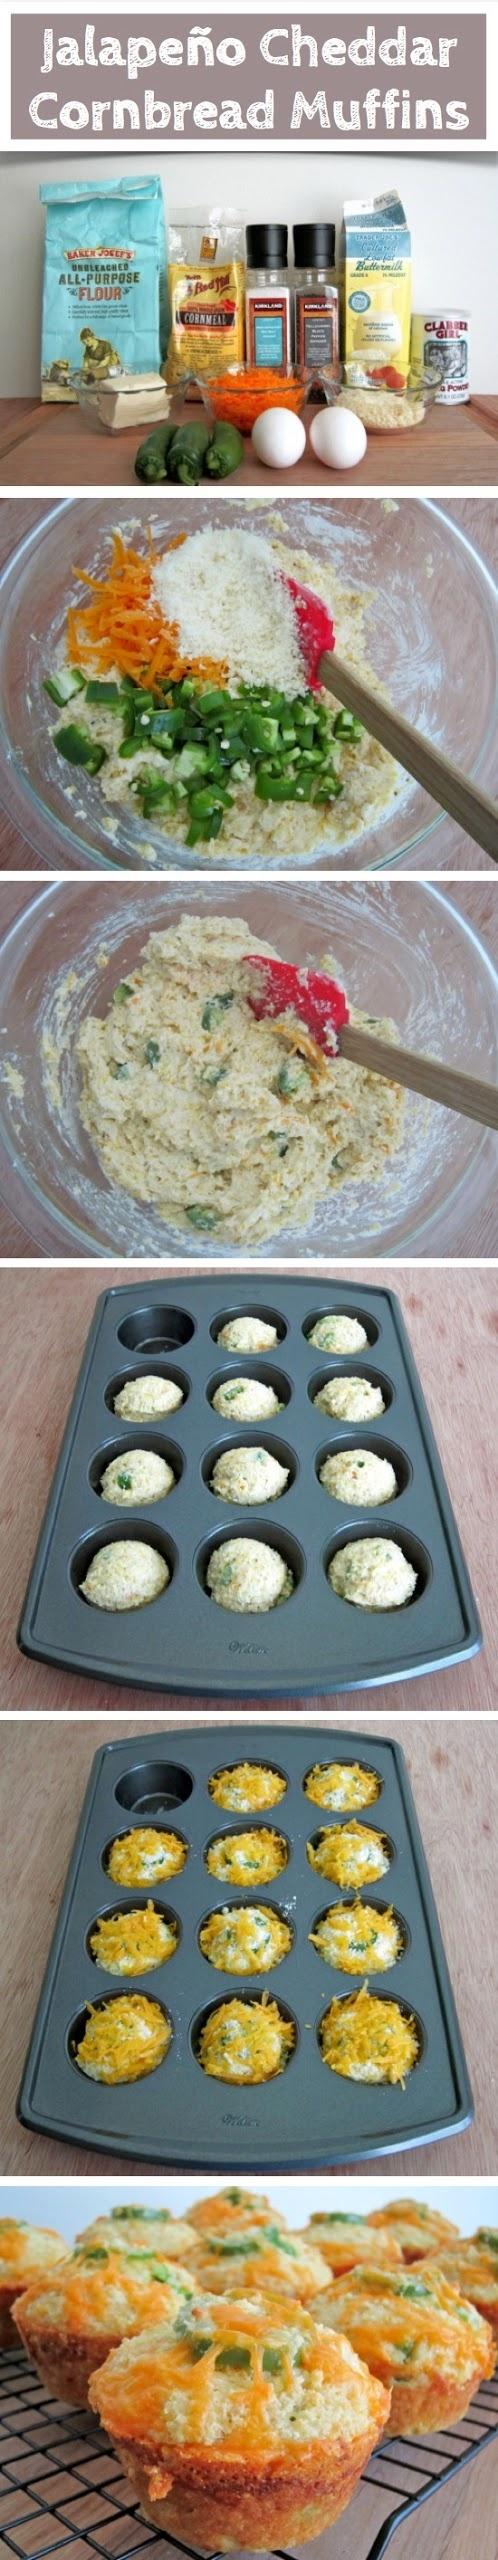 joysama images: Jalapeño Cheddar Cornbread Muffins